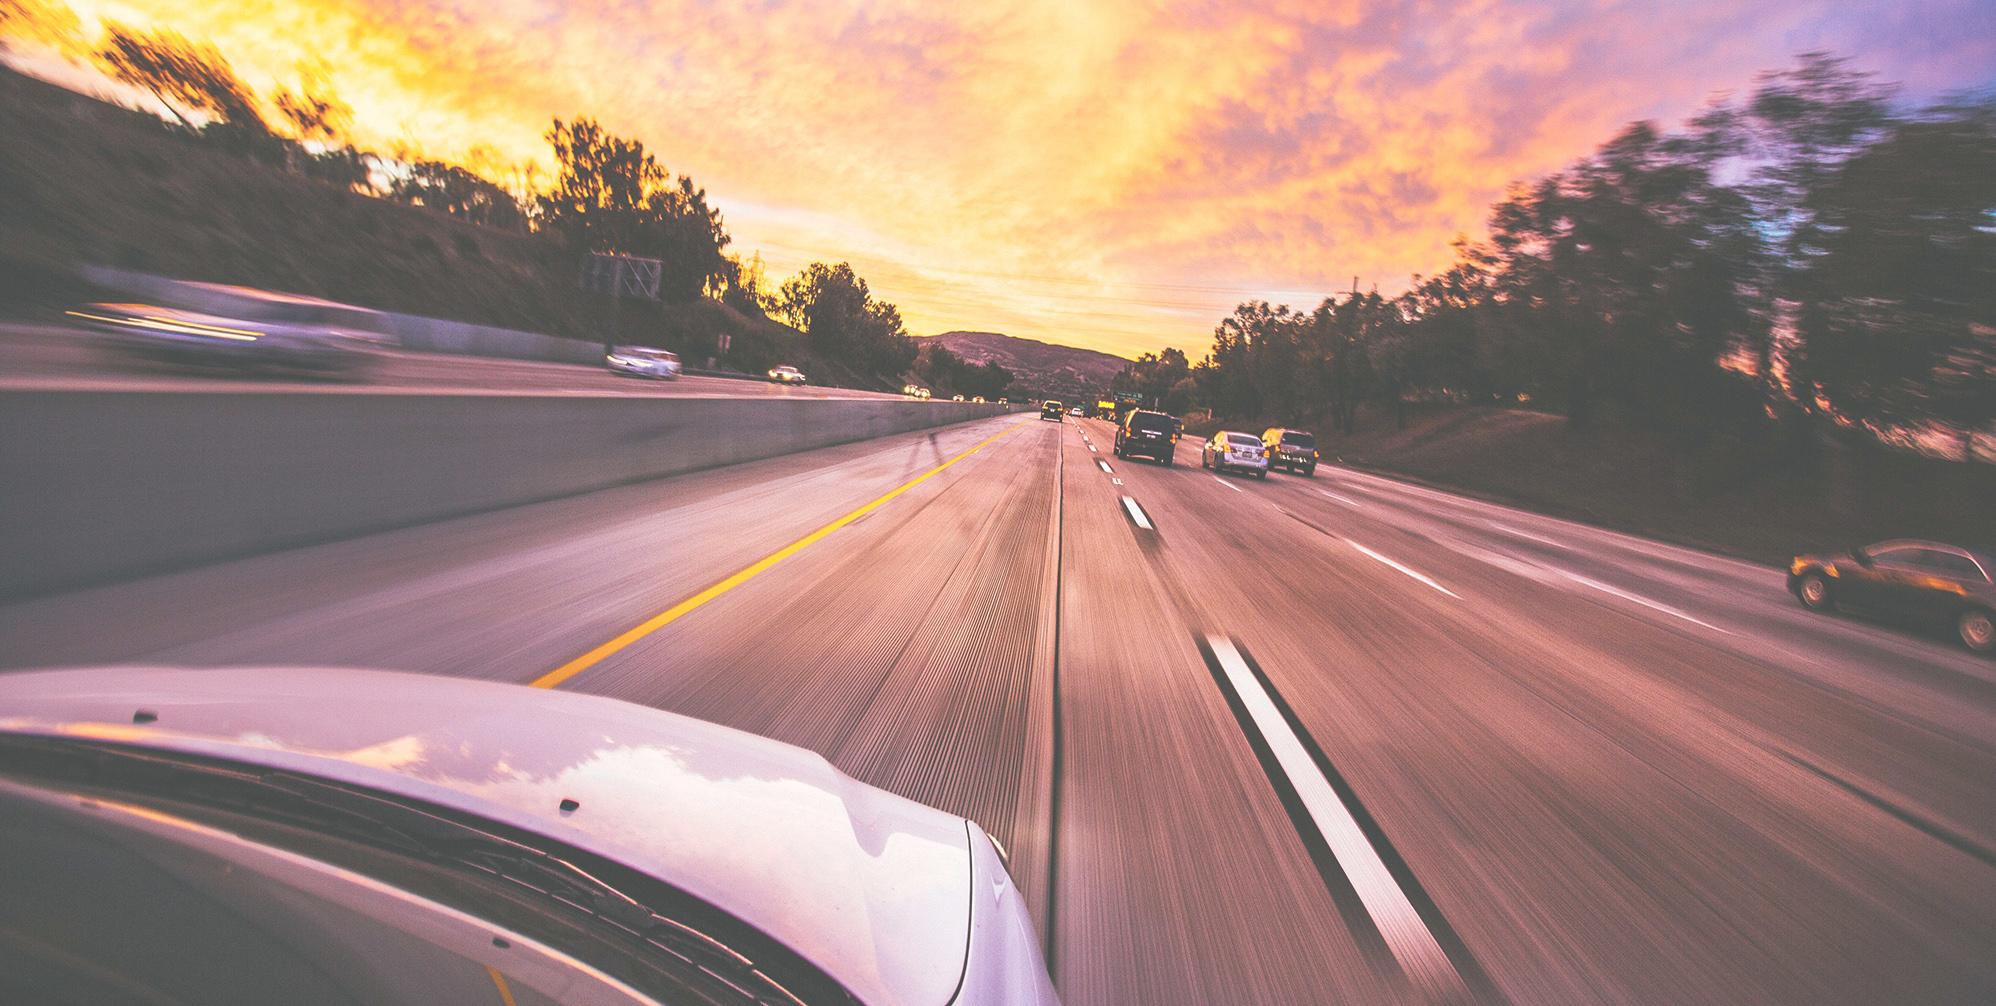 automotive law